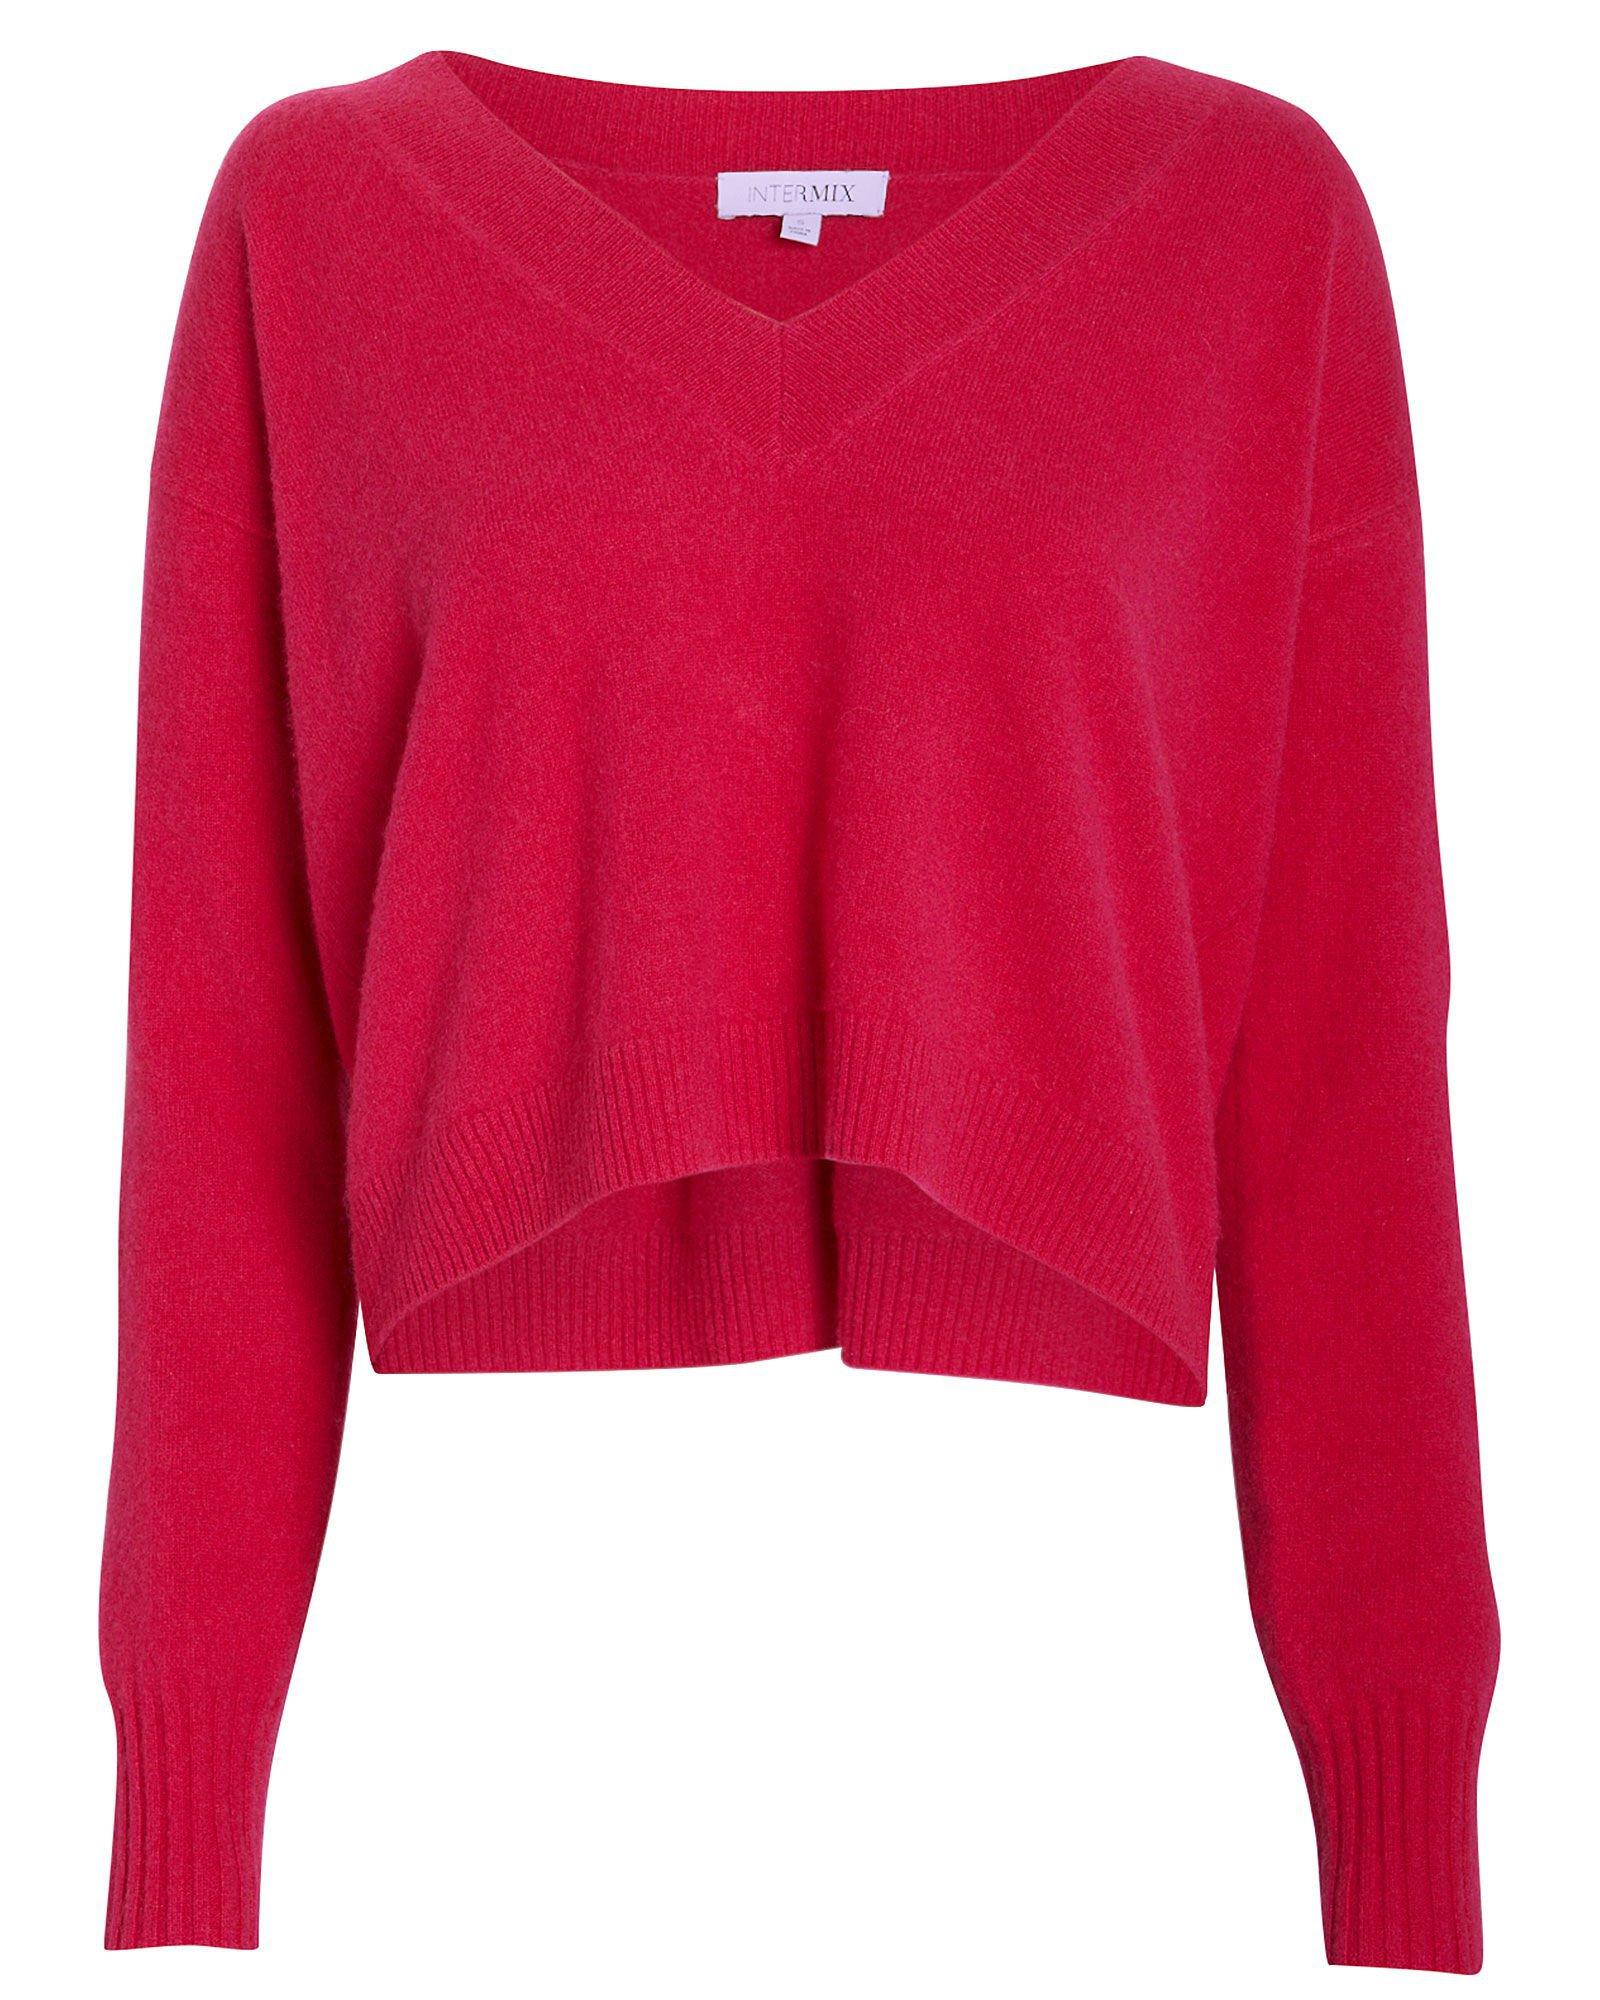 Elroy V-Neck Cashmere Sweater